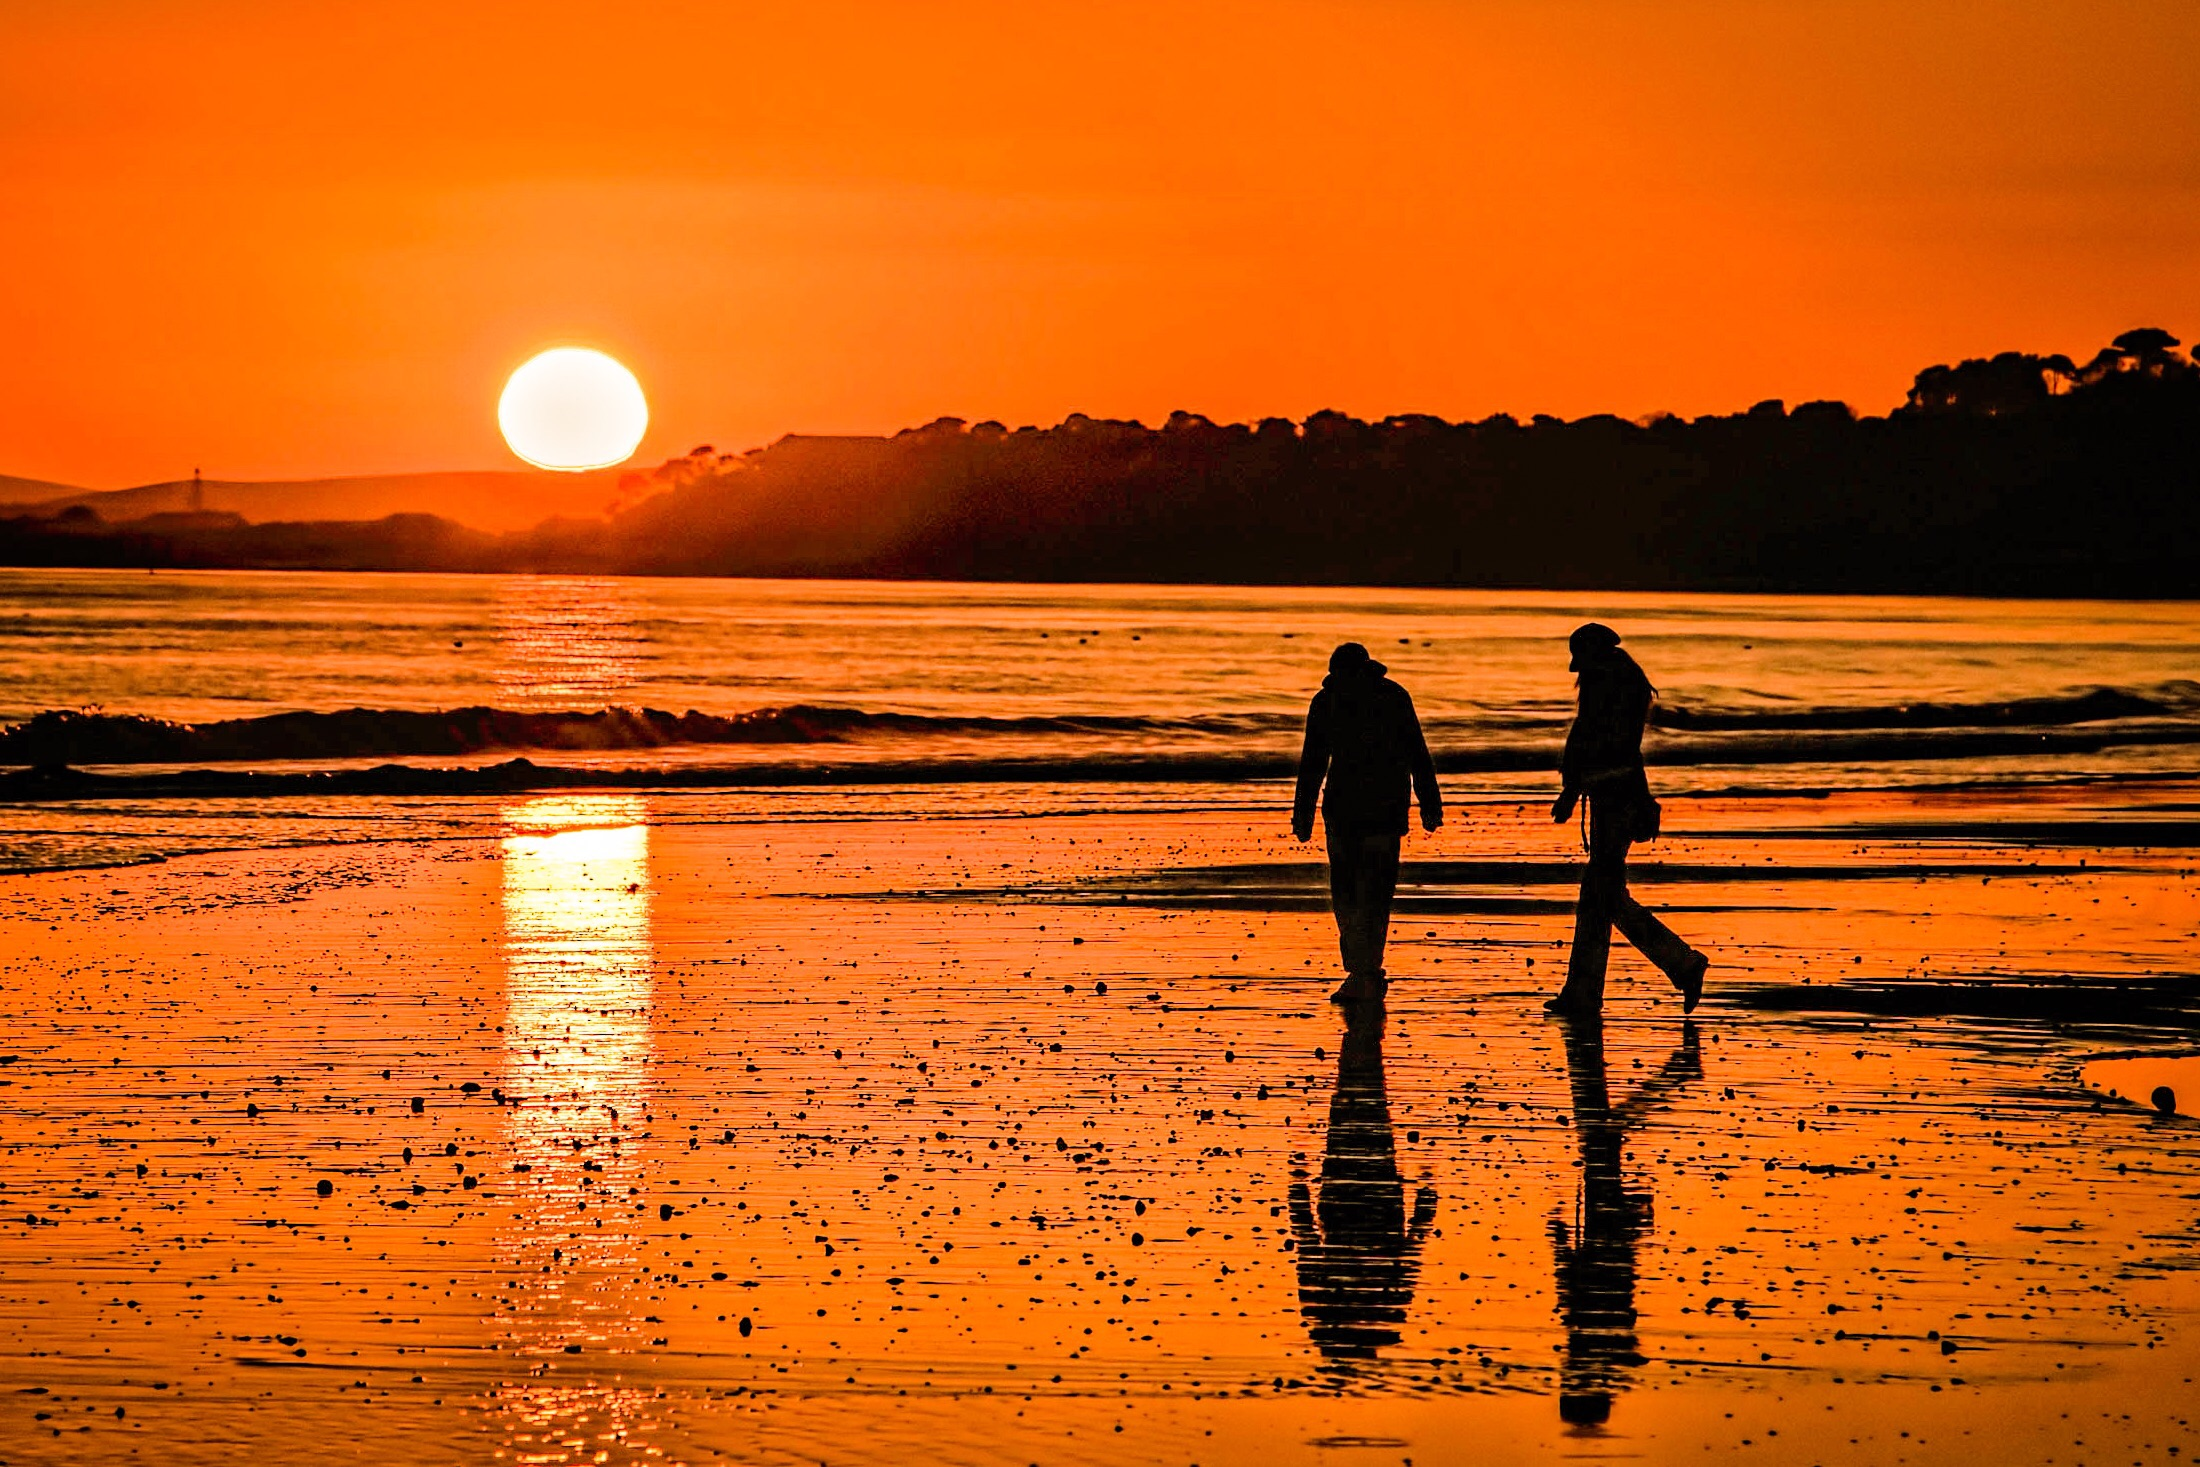 Sunset by Rick McEvoy Bournemouth Photographer